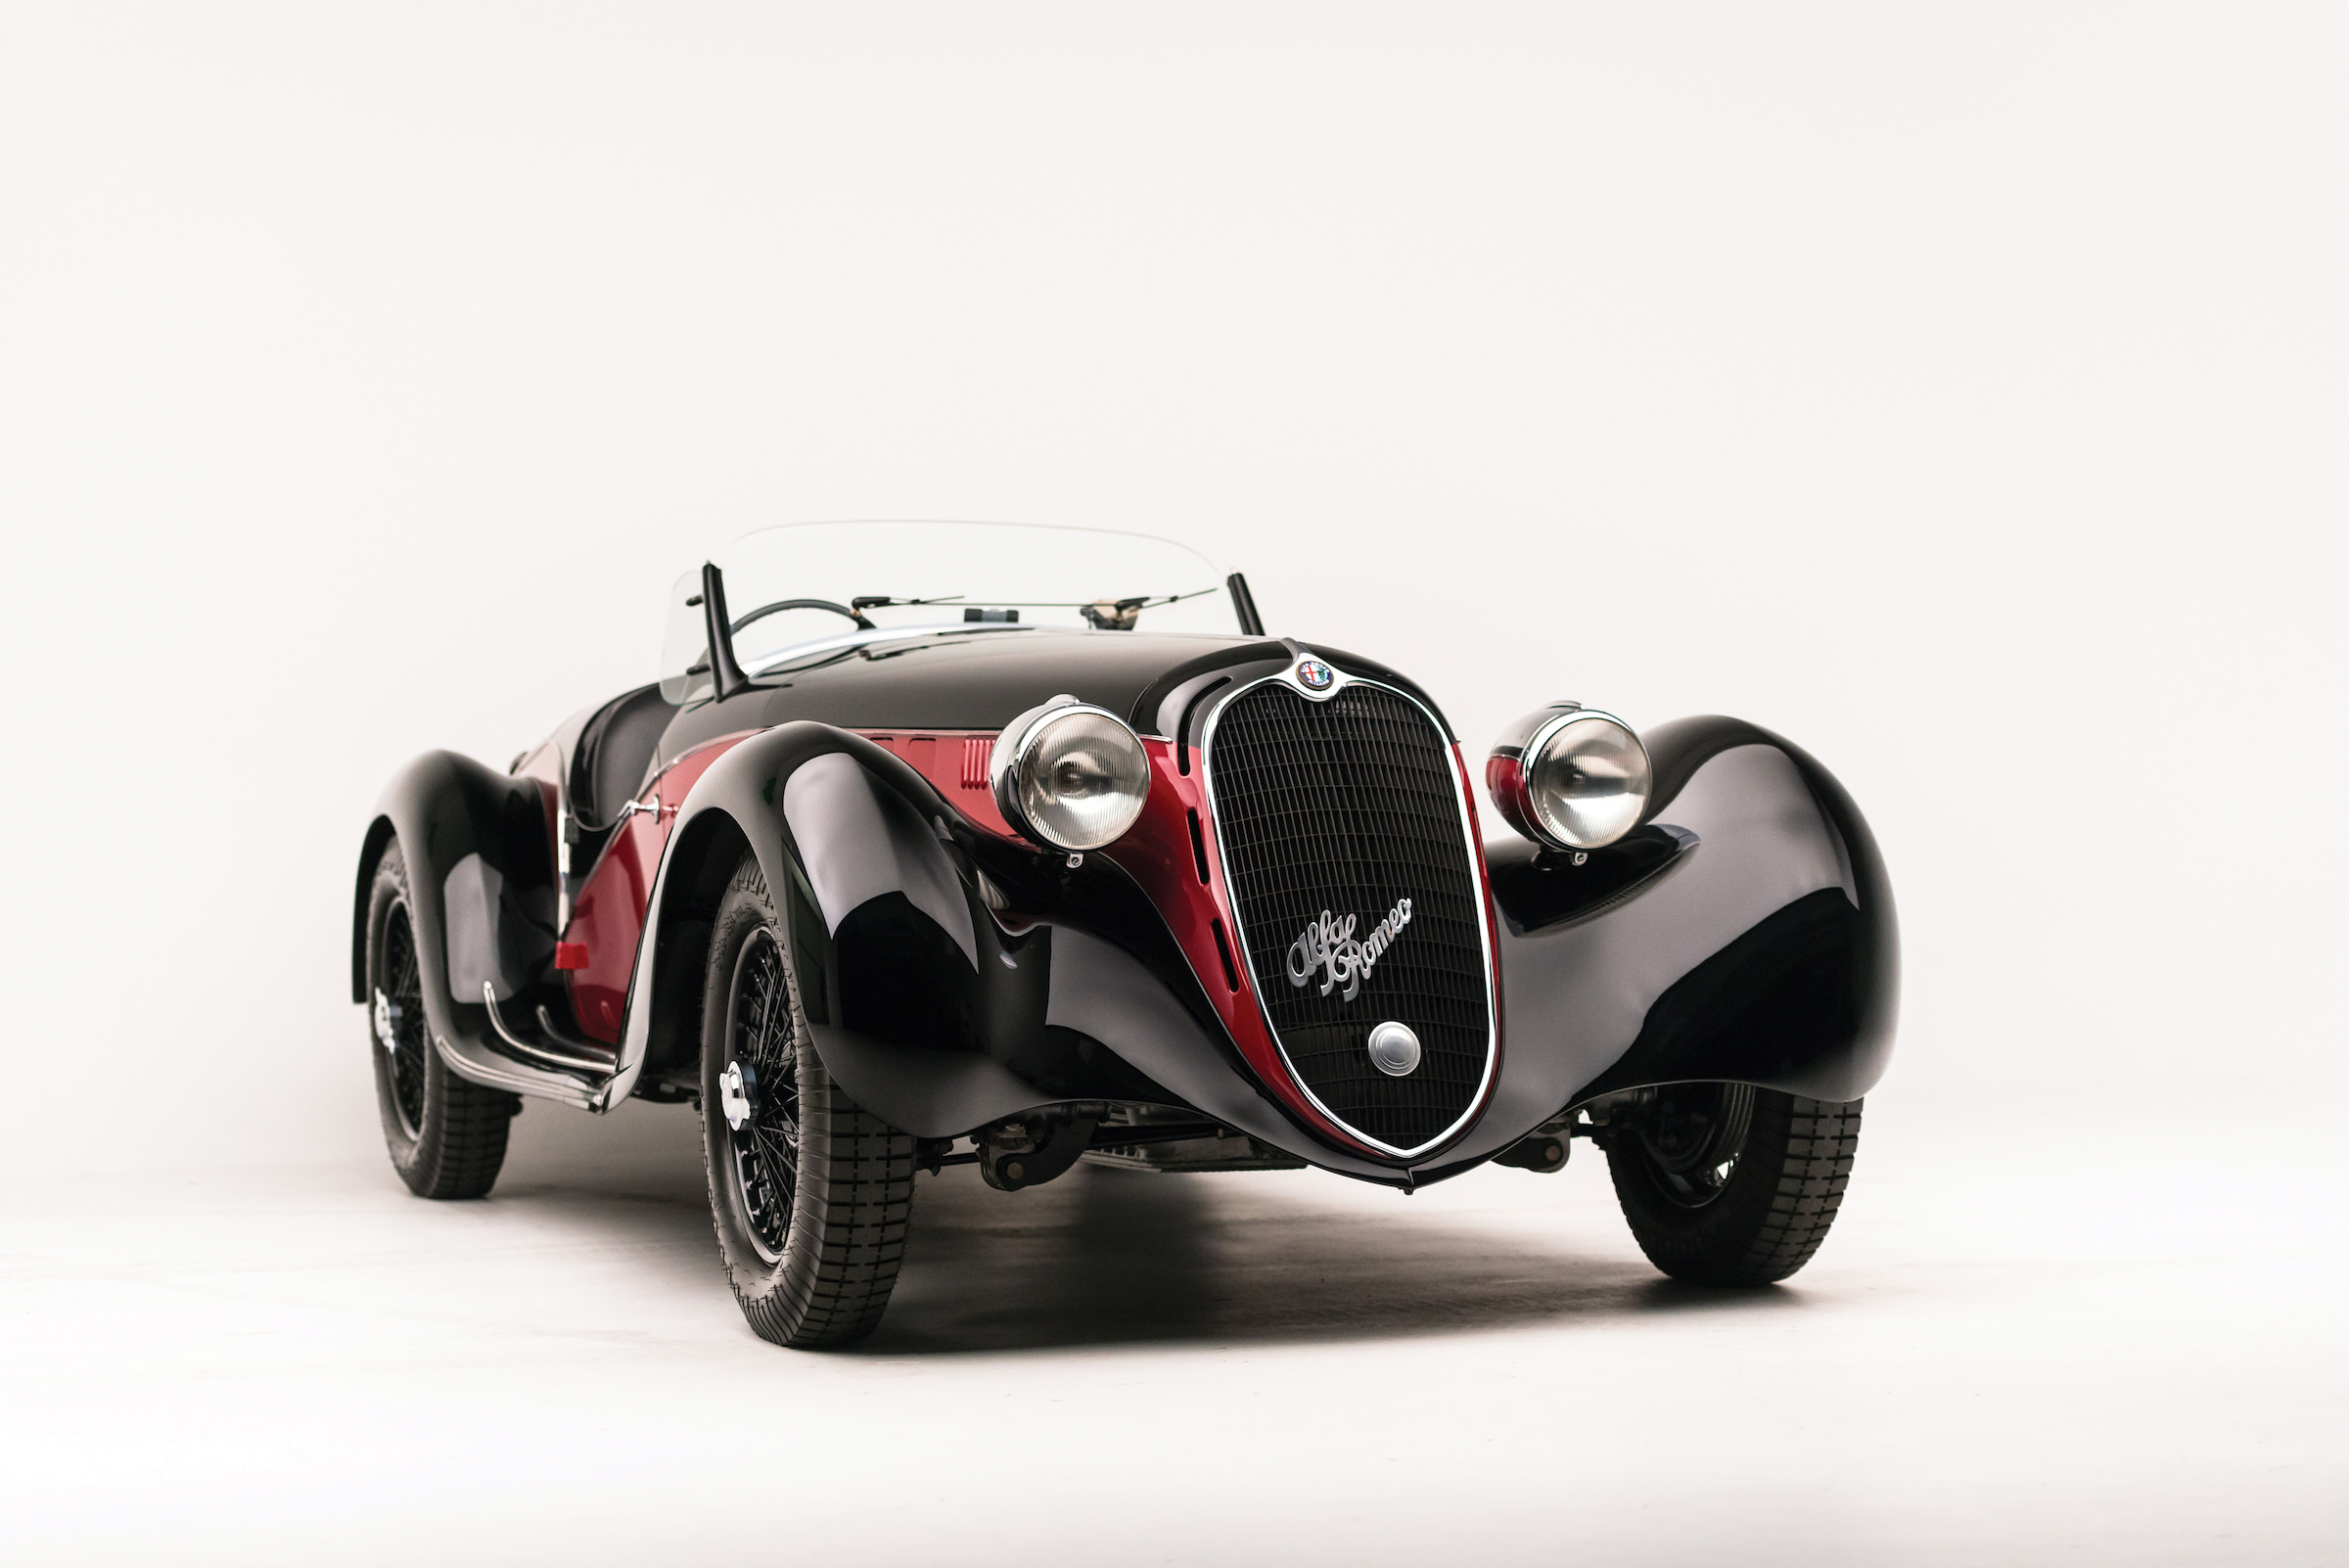 Alfa Romeo 6c 2500 Ss For Sale 1942 Alfa Romeo 6c 2500 Ss